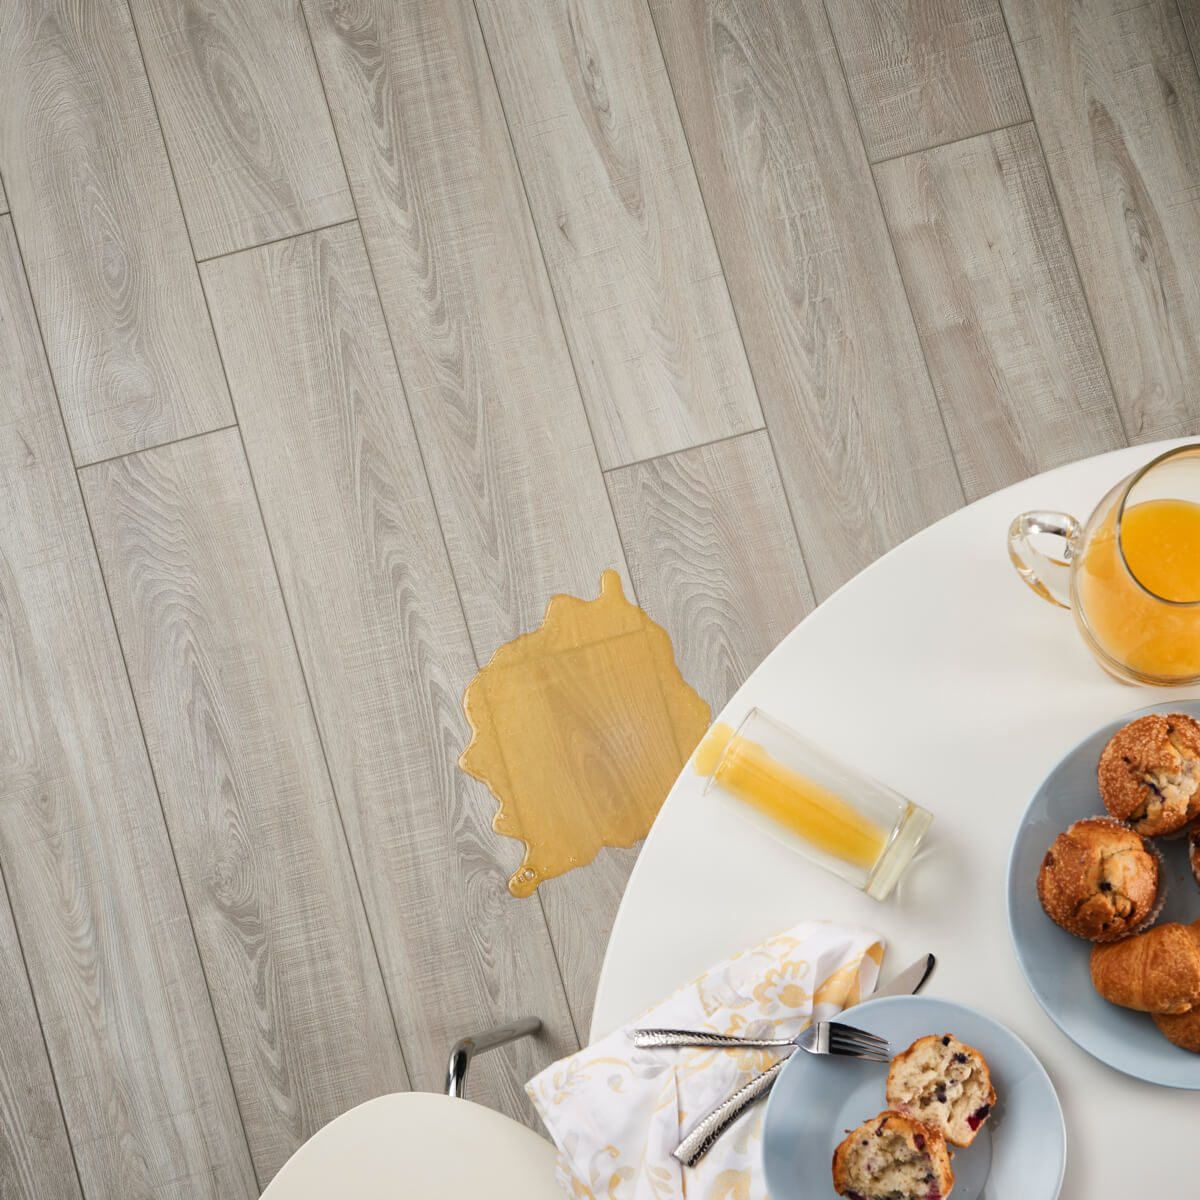 Juice spill | Westport Flooring